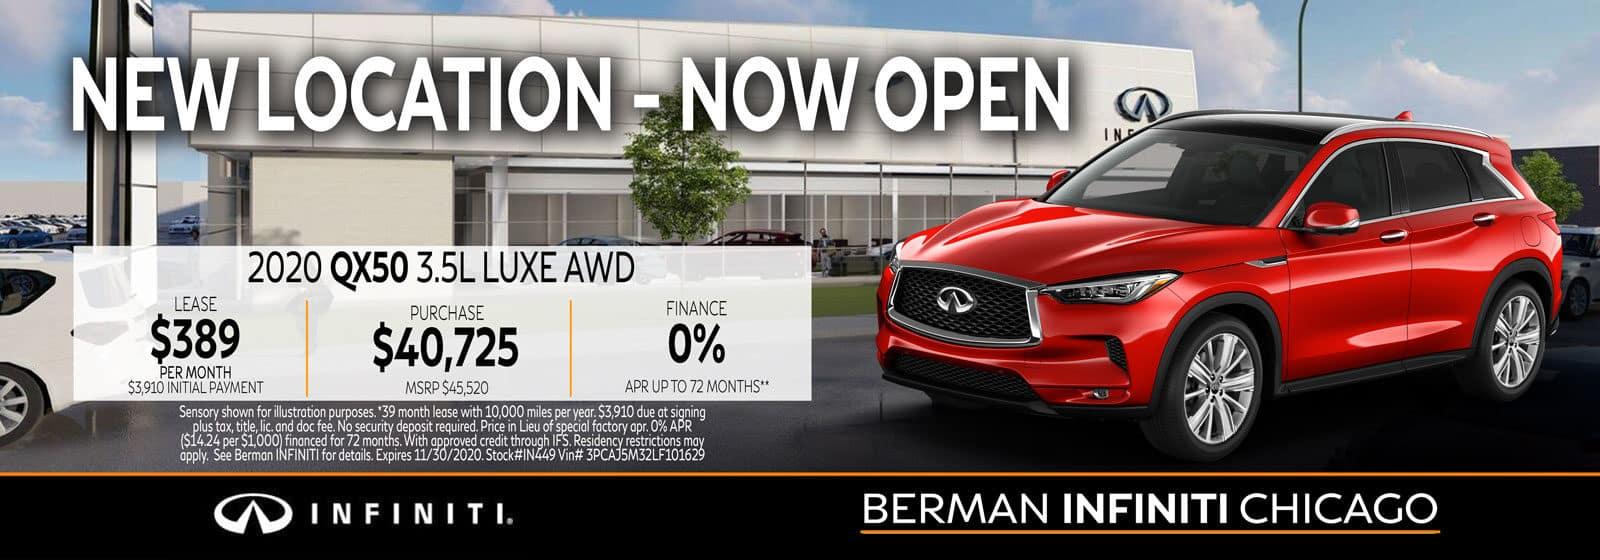 New 2020 INFINITI QX50 November offer at Berman INFINITI Chicago!